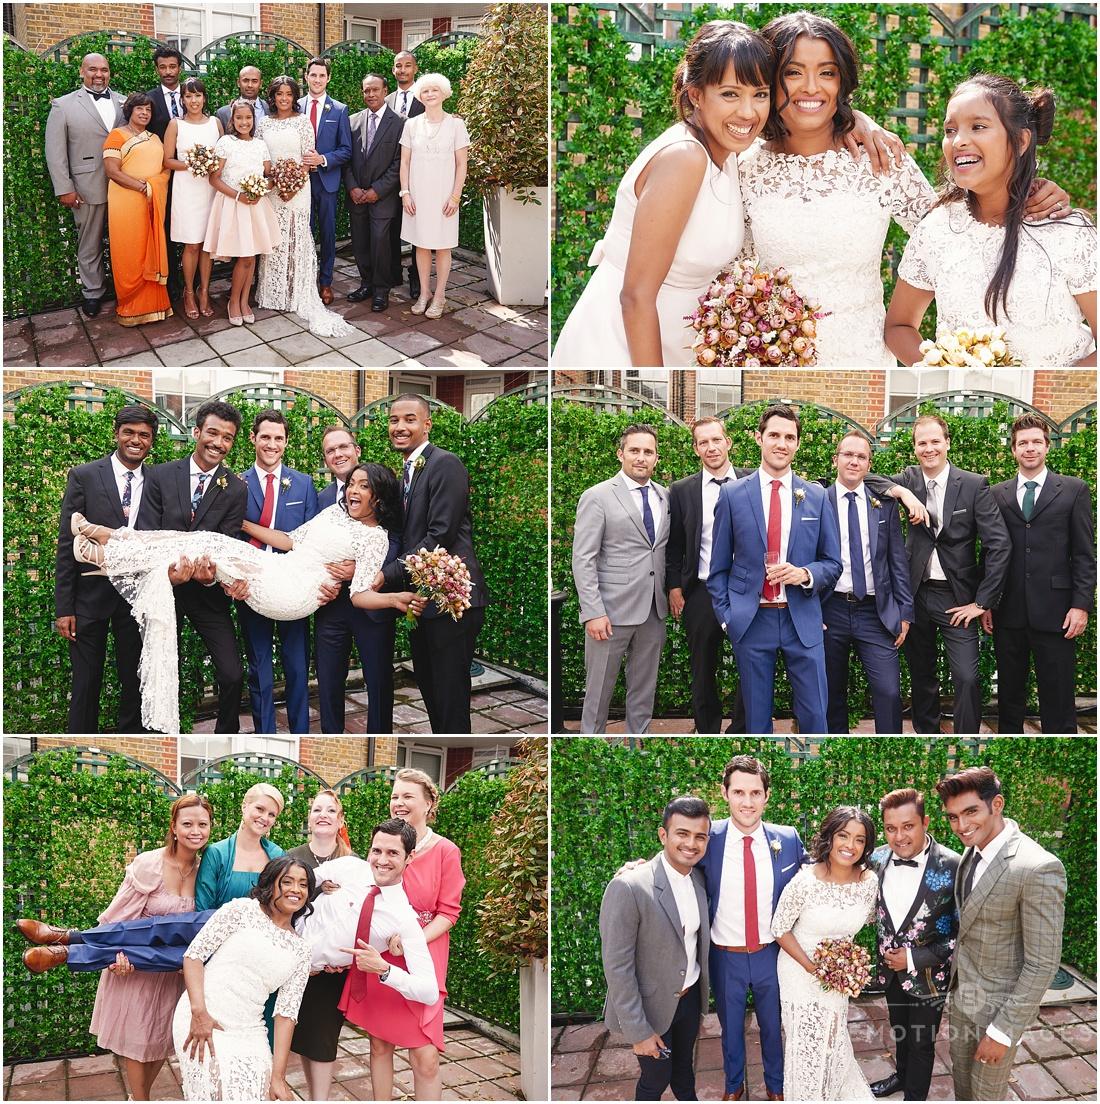 Searcys_Knightsbridge_London_wedding_e-motion_images_011.JPG